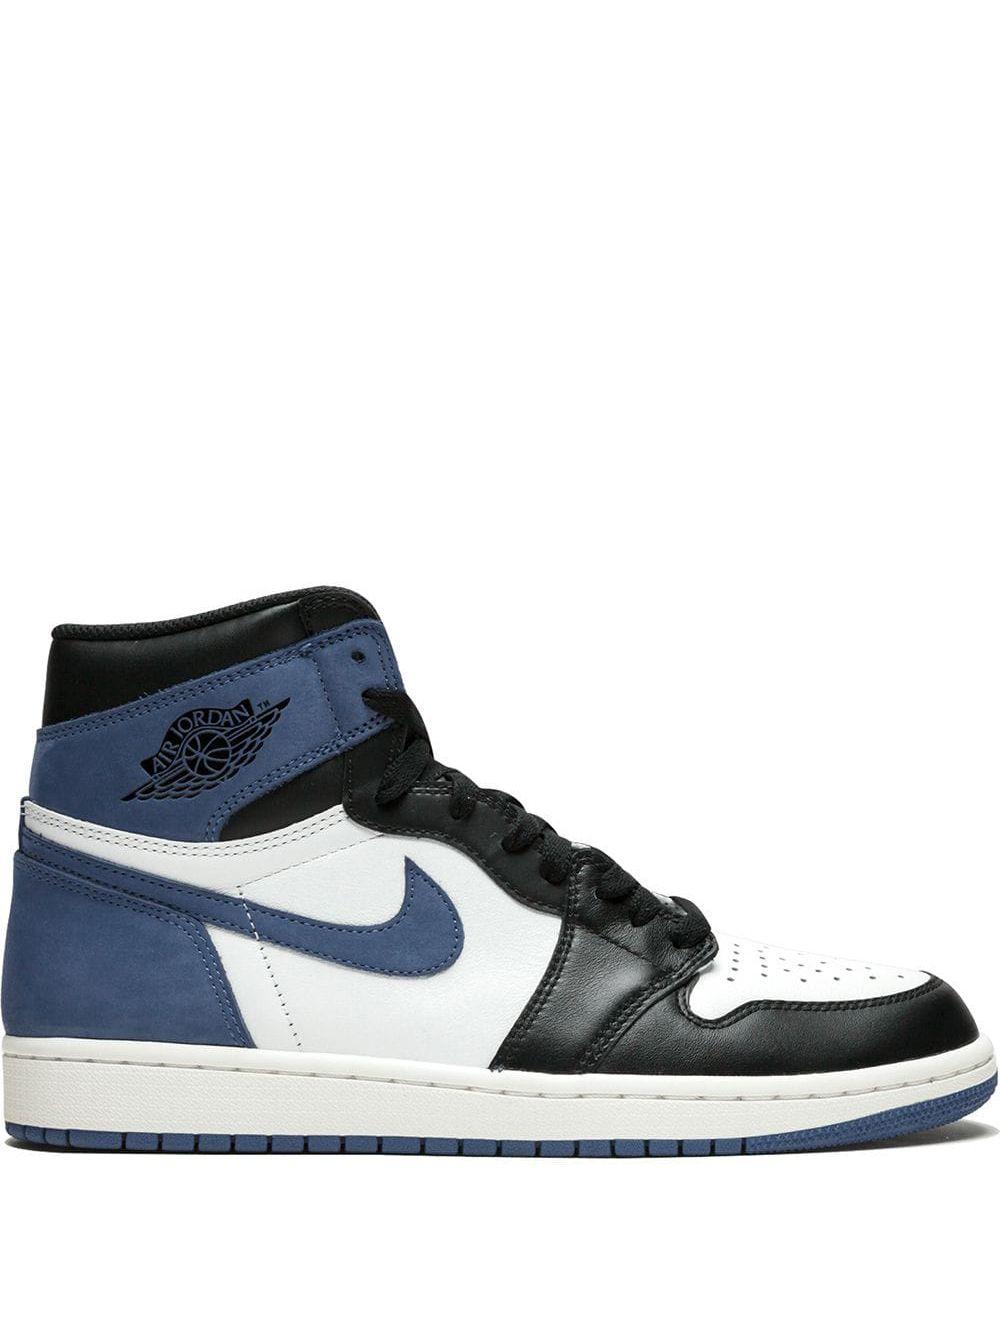 finest selection 4dd17 3e6fa Jordan  Air Jordan 1 Retro High OG  Sneakers - Blau von Jordan